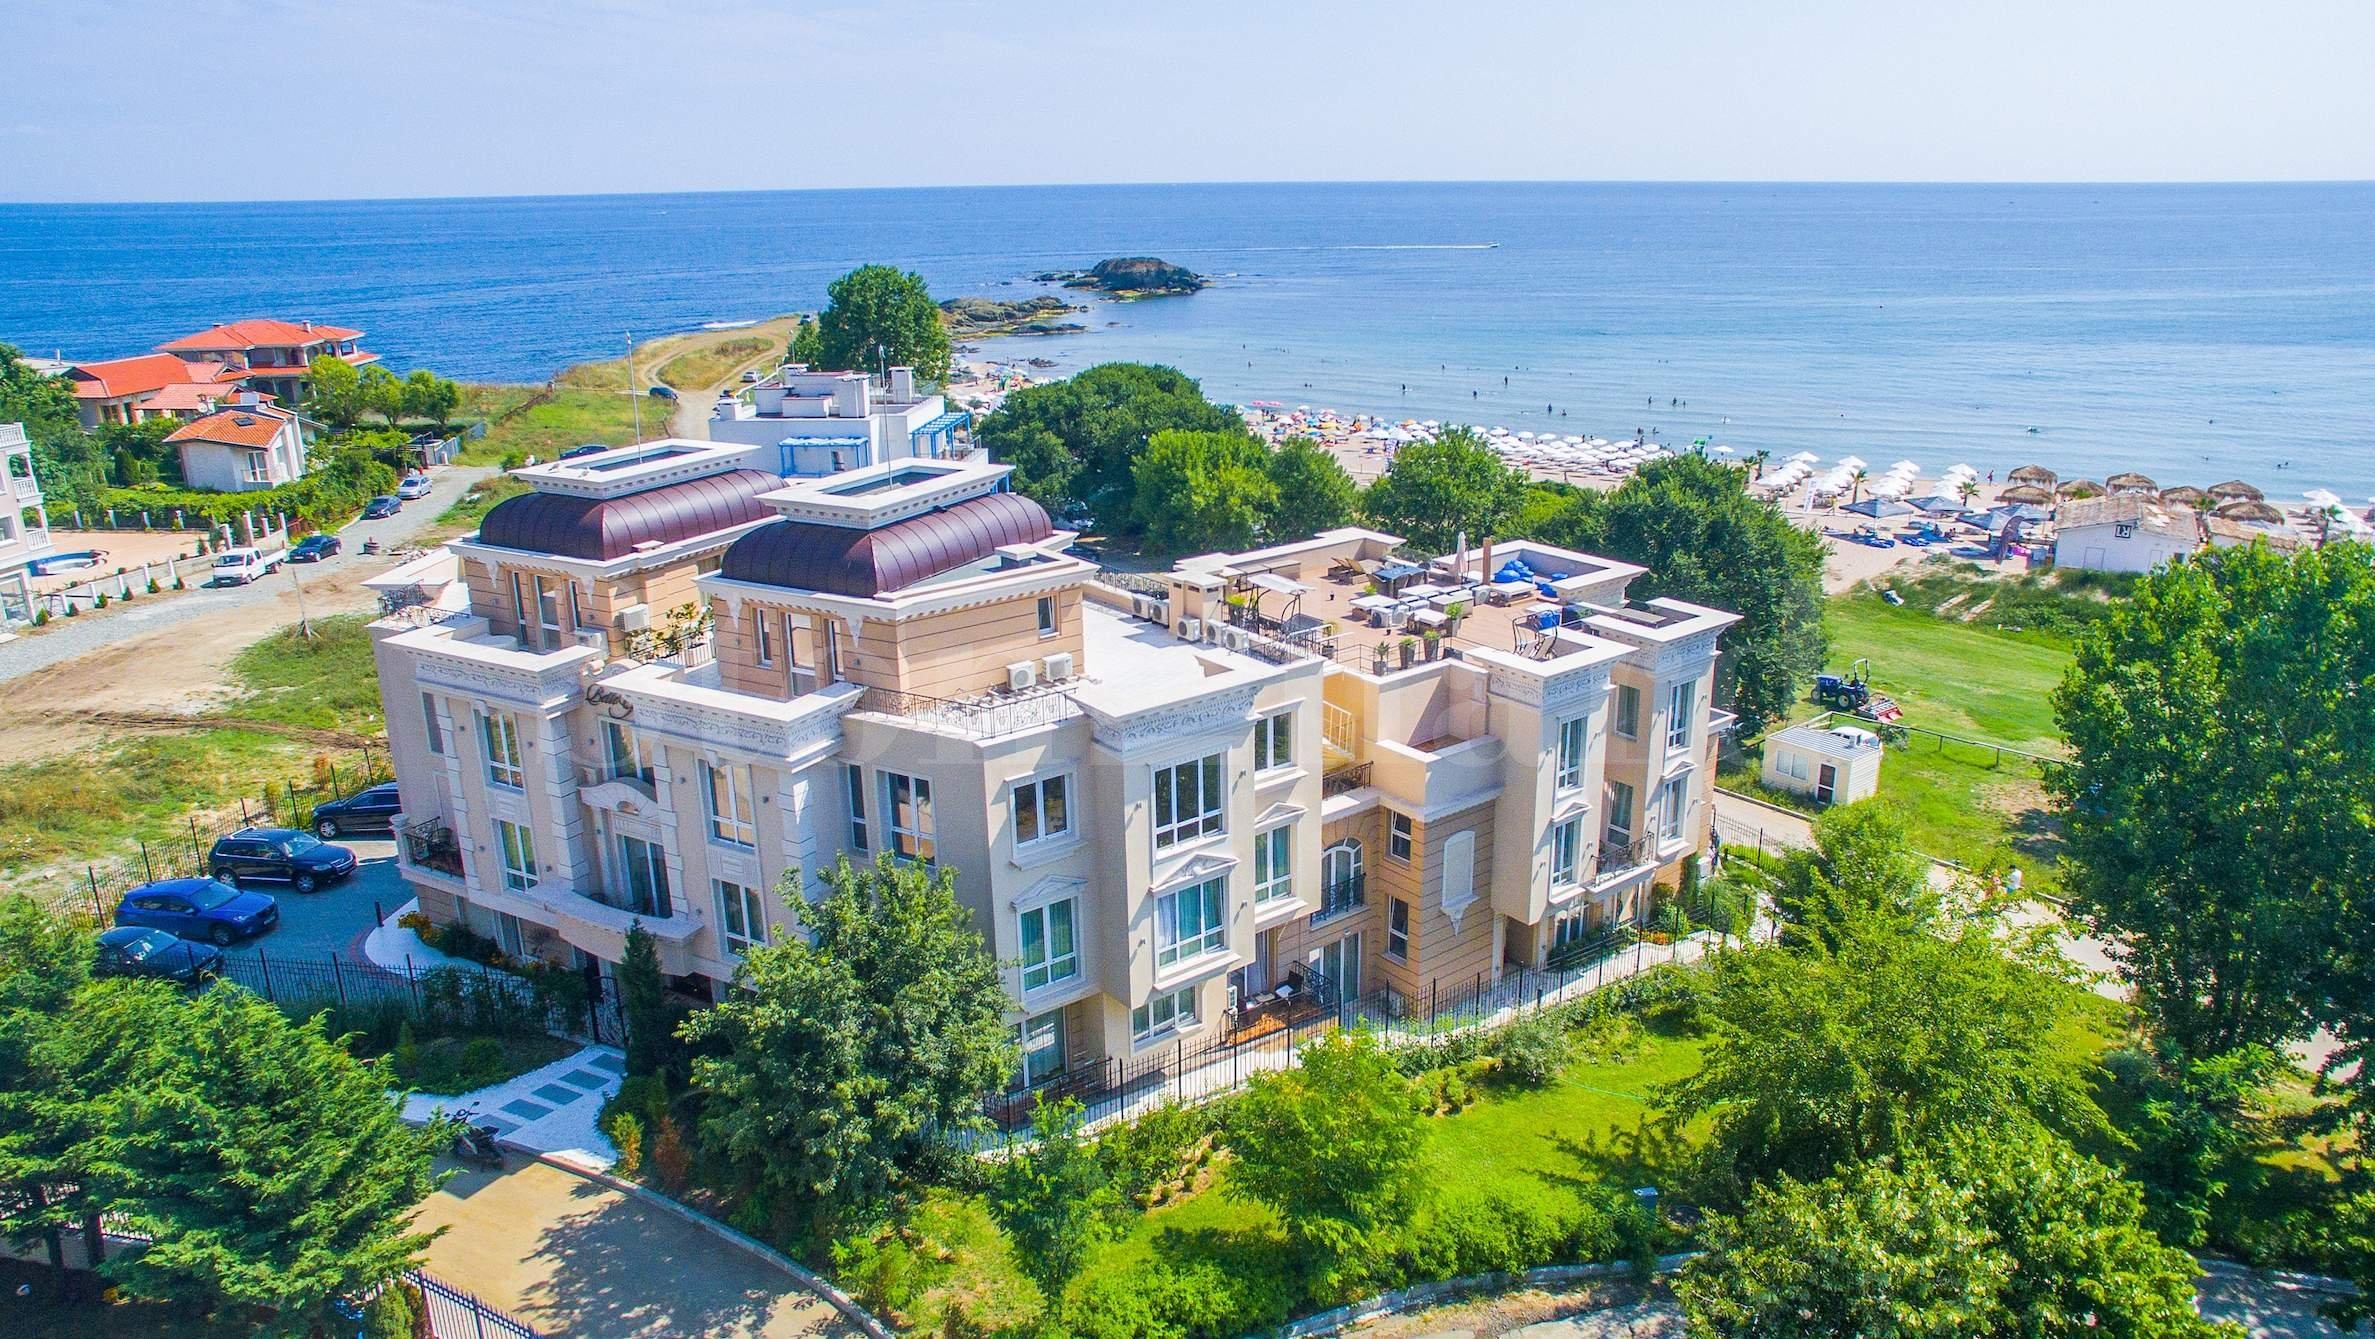 Луксозни апартаменти в морска резиденция Belle Époque2 - Stonehard